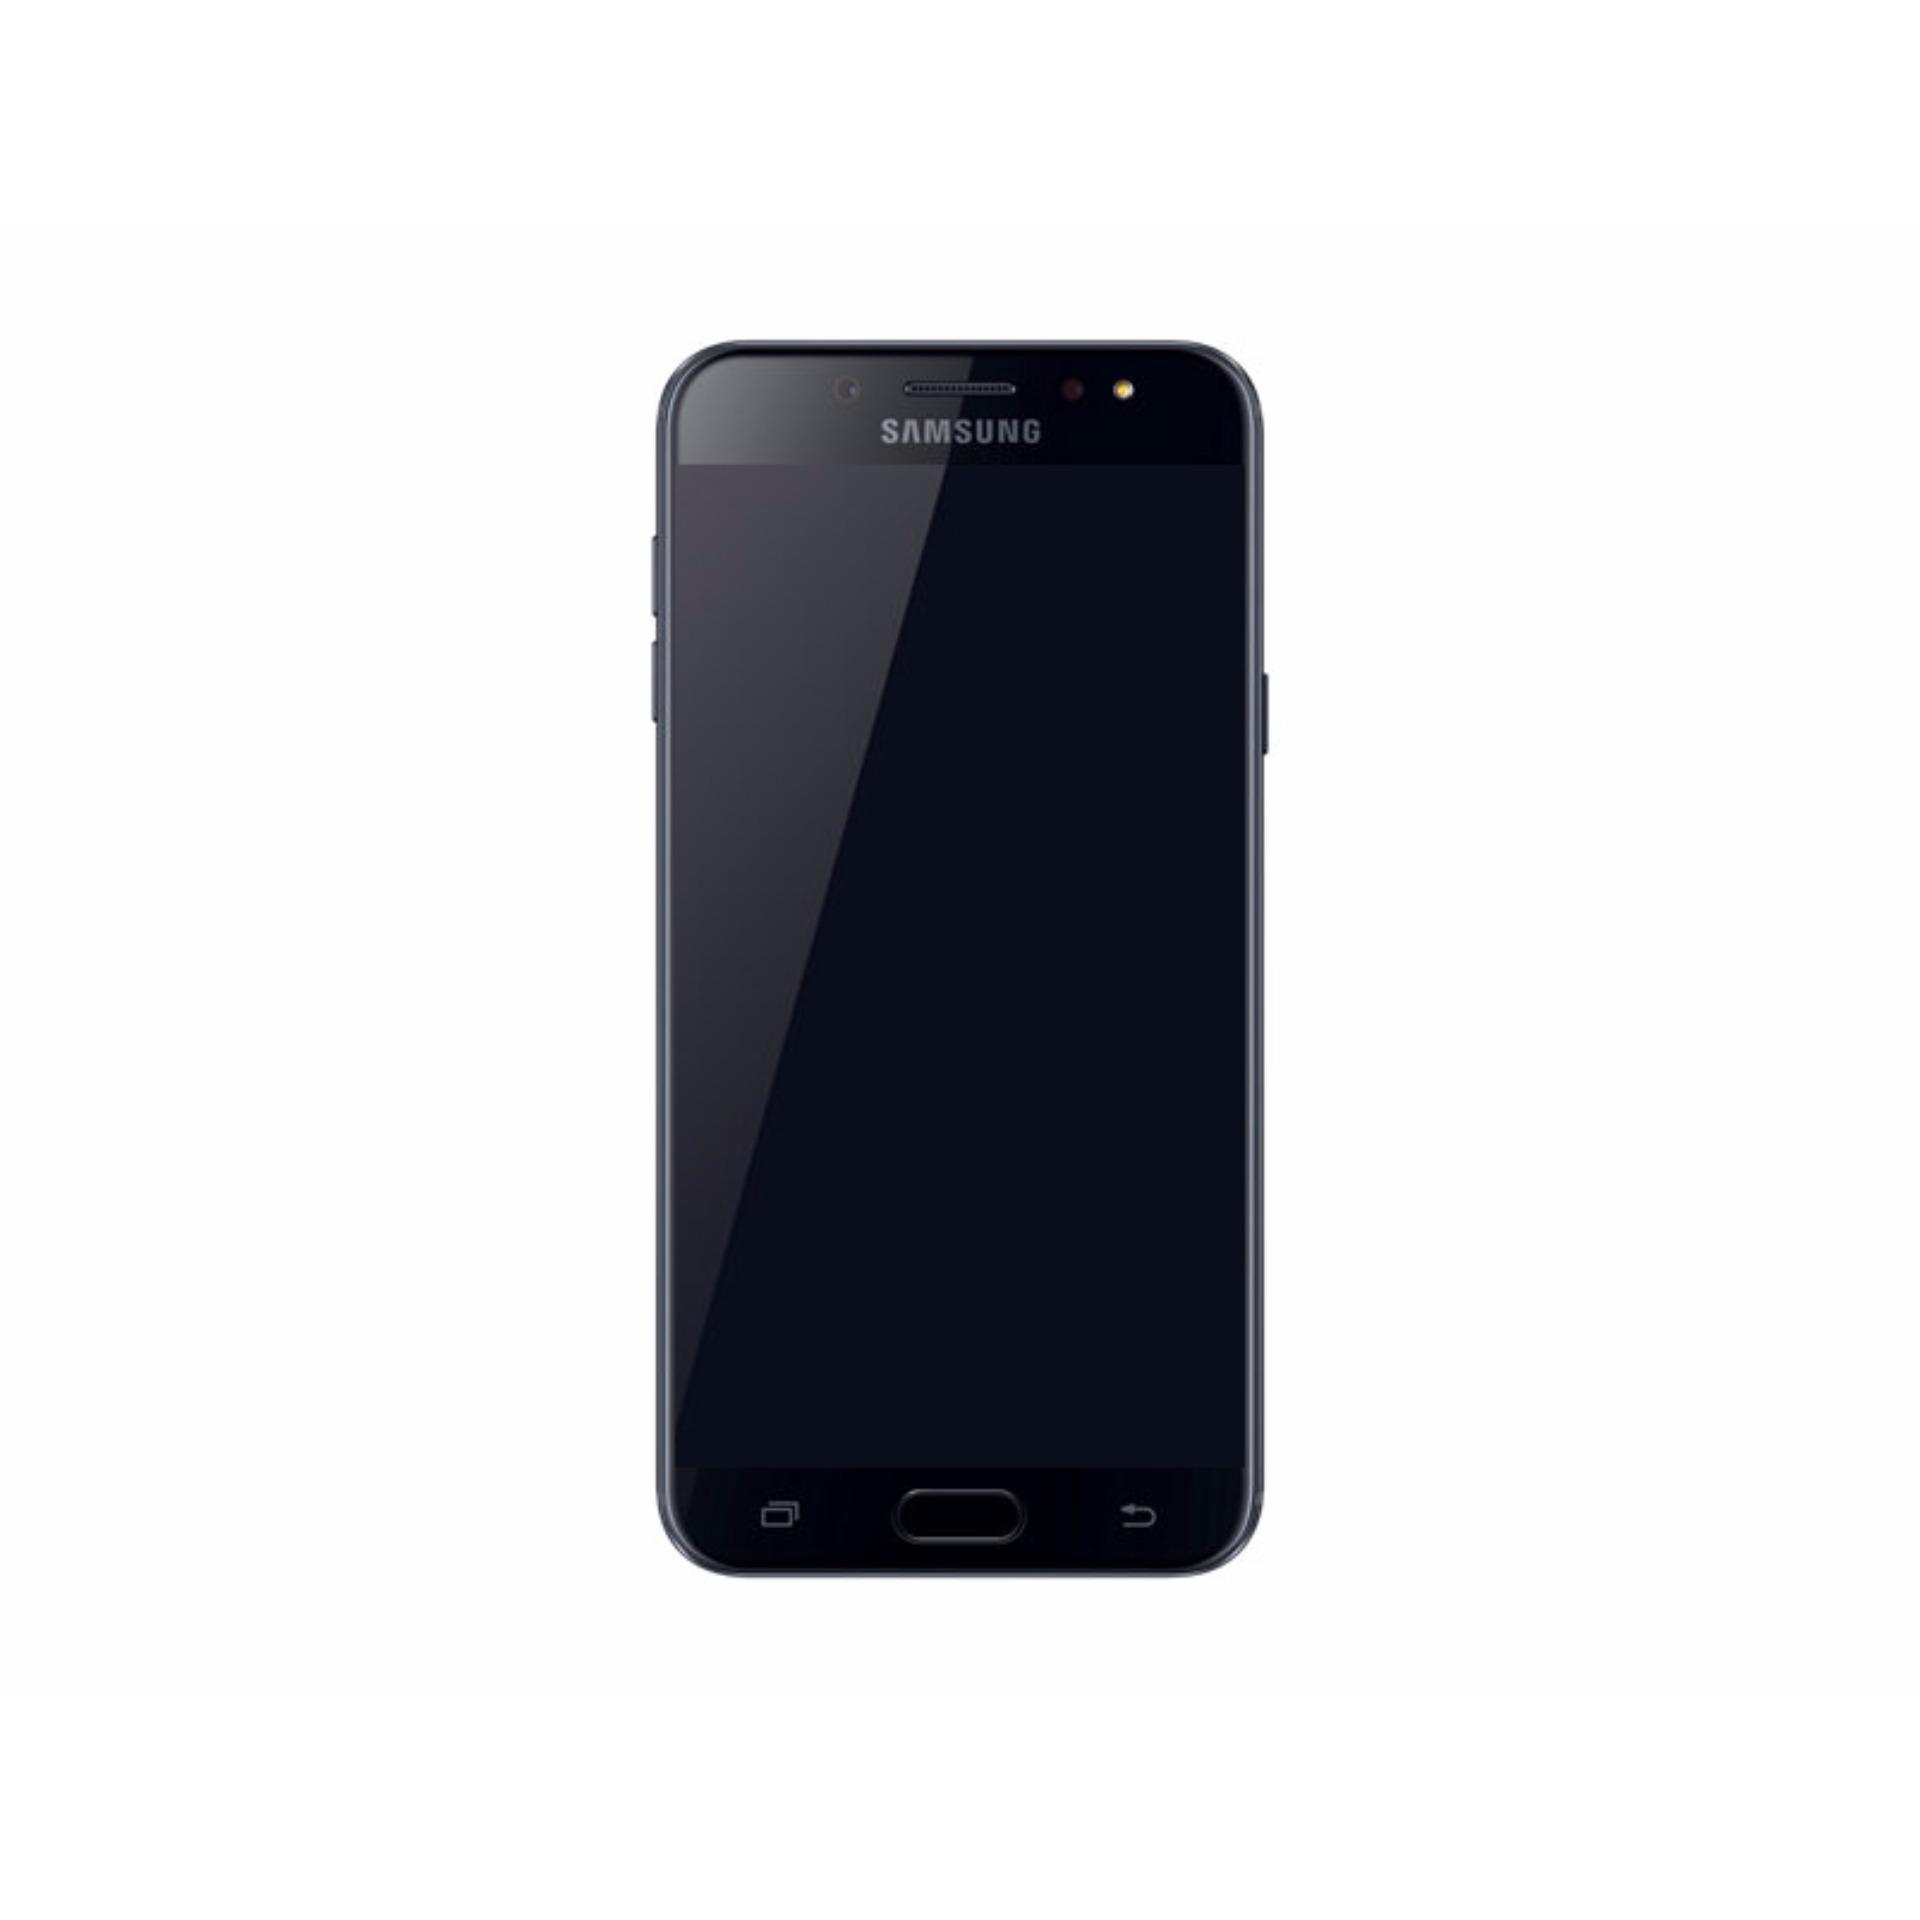 Garansi Resmi SEIN 1 Tahun Samsung Galaxy J7 Plus Smartphone